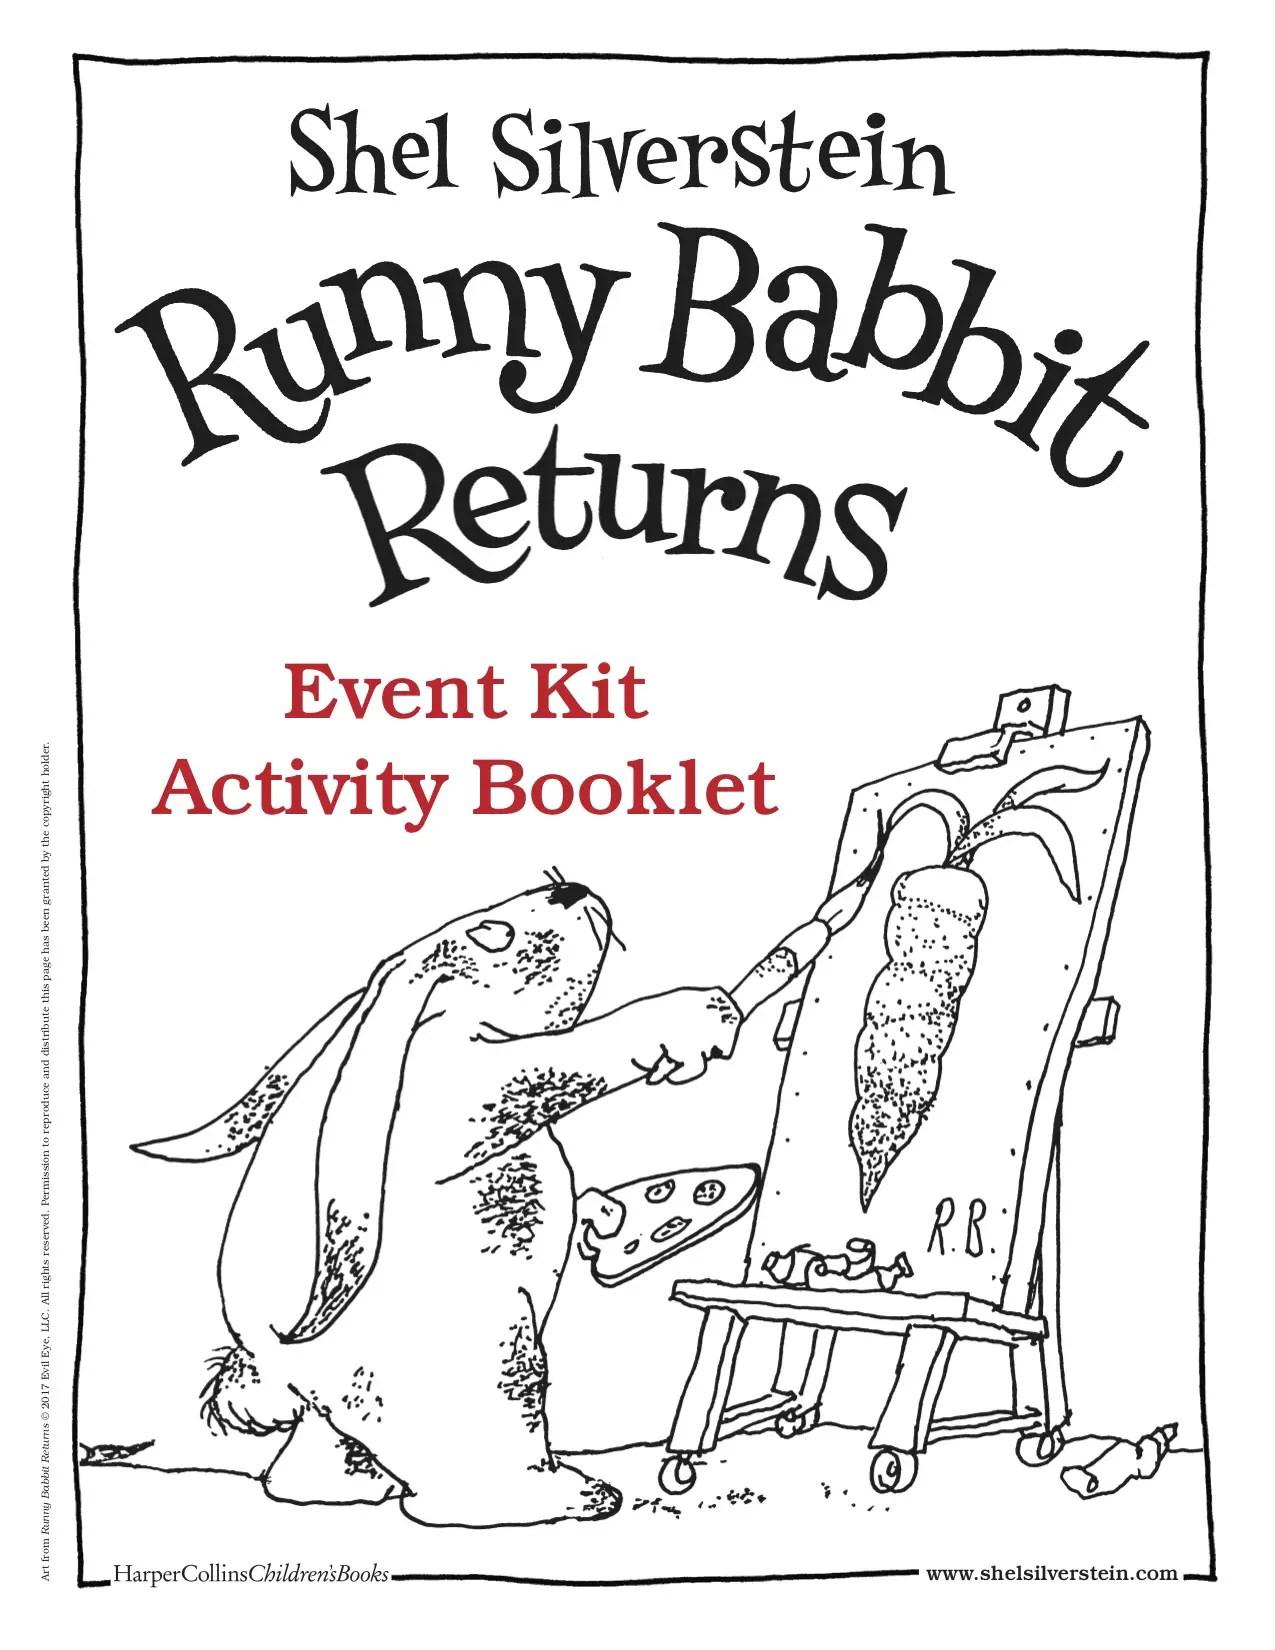 Runny babbit Poems